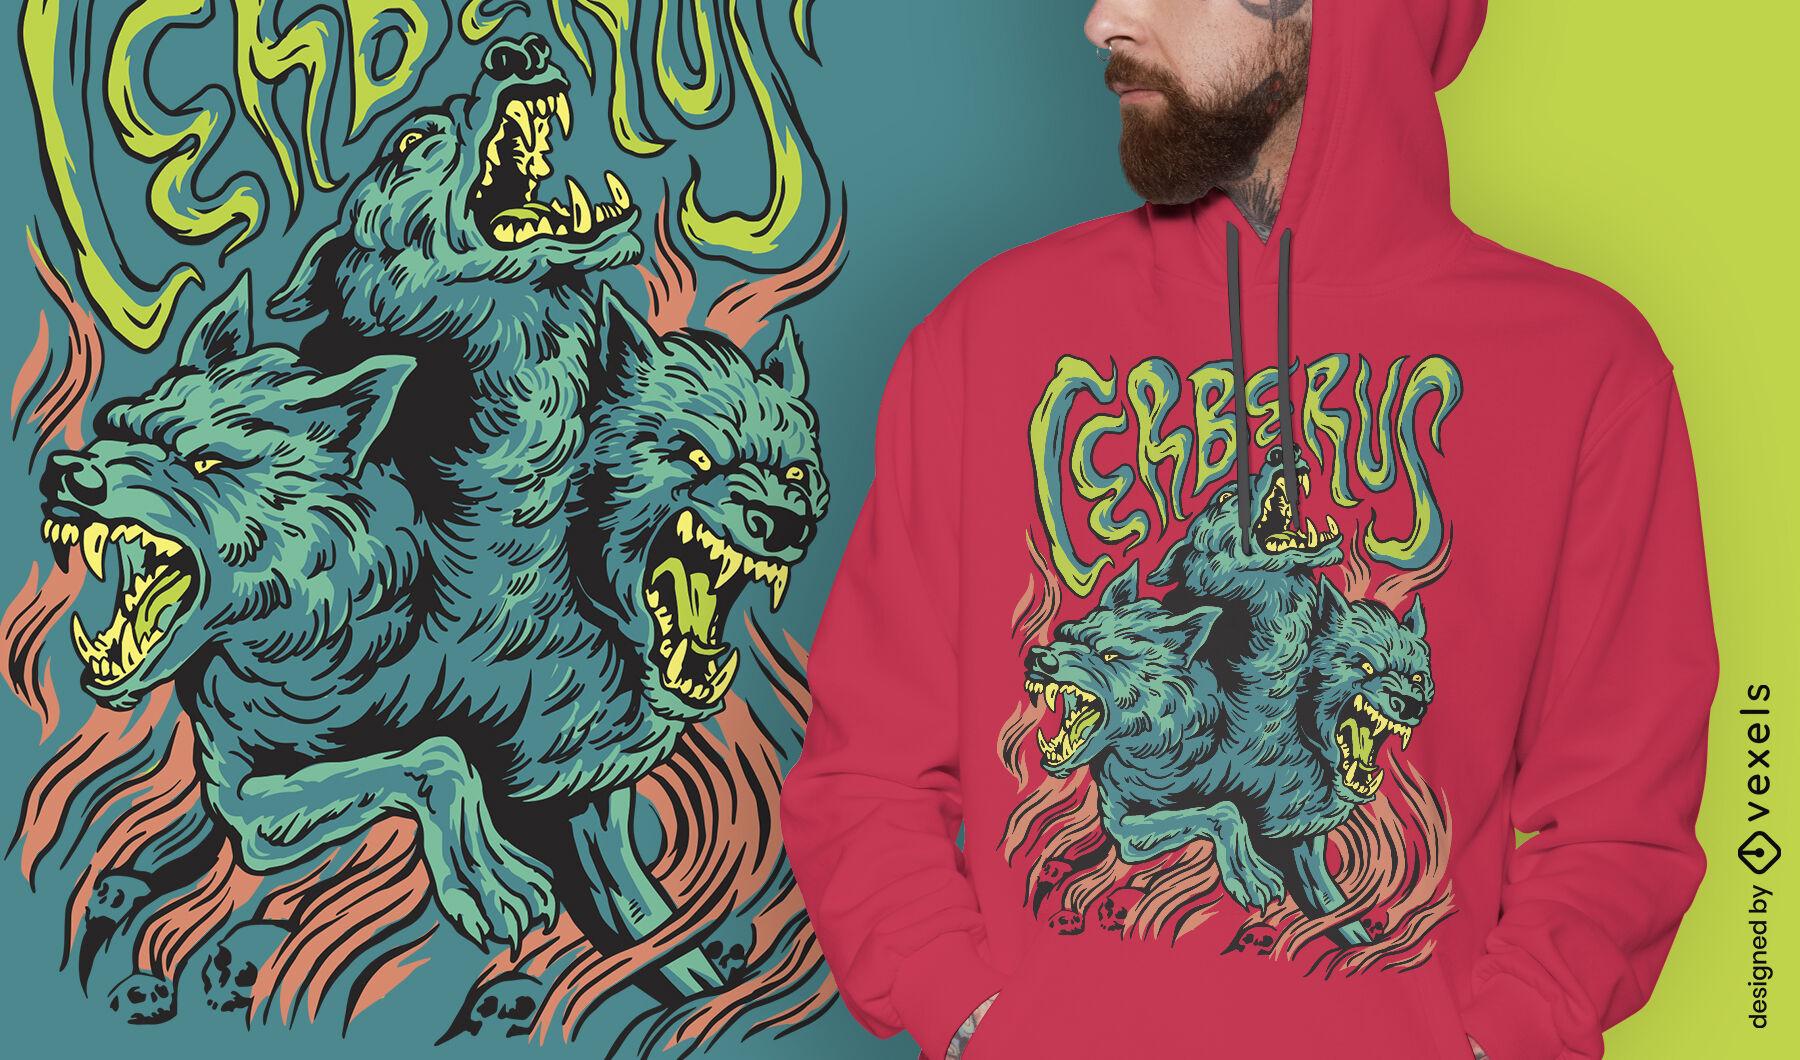 Cerberus monster mythical greece t-shirt design